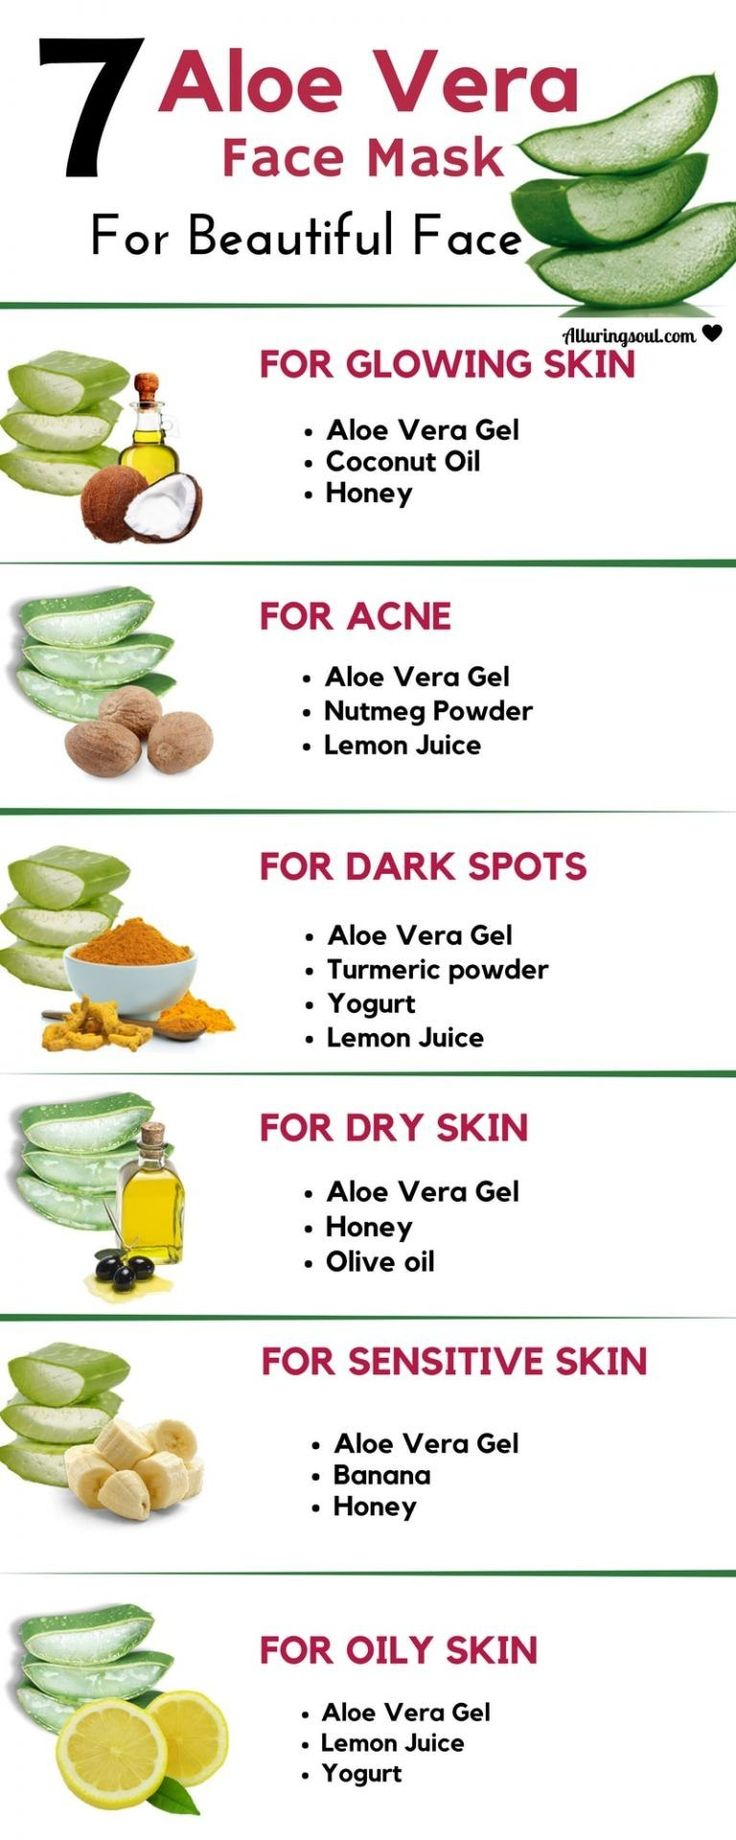 7 Aloe Vera Face Mask For Bright And Beautiful Skin